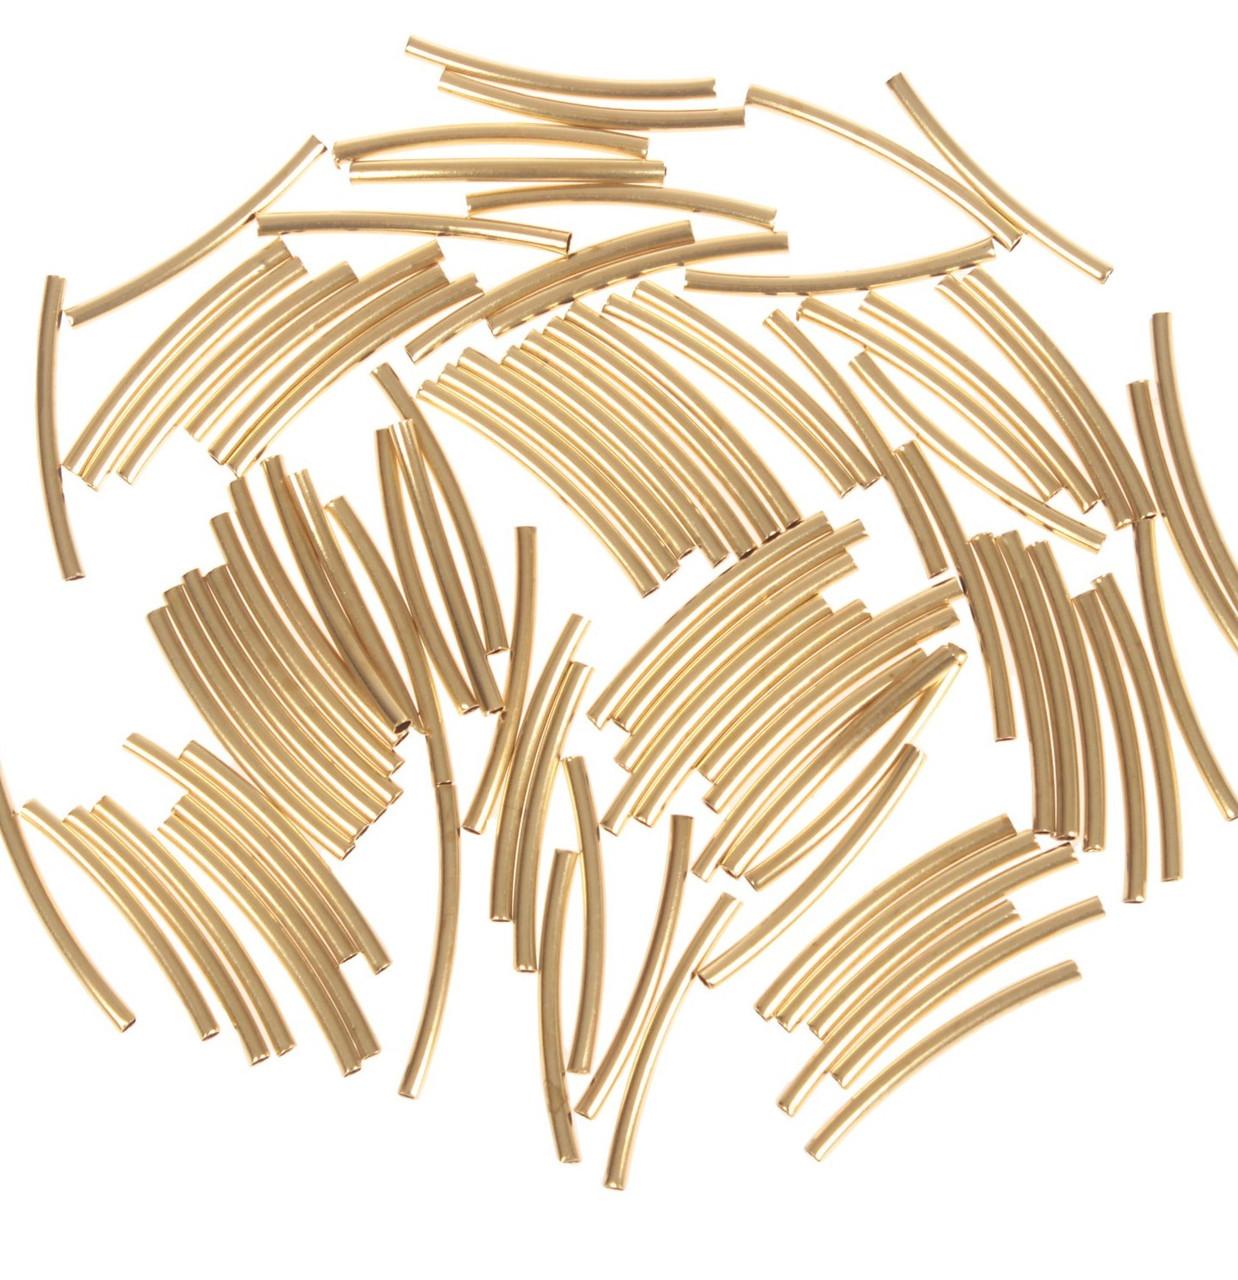 "Декор для творчества металл ""Изогнутая трубка"" набор 90 шт 2,5х0,2 см - фото 1"